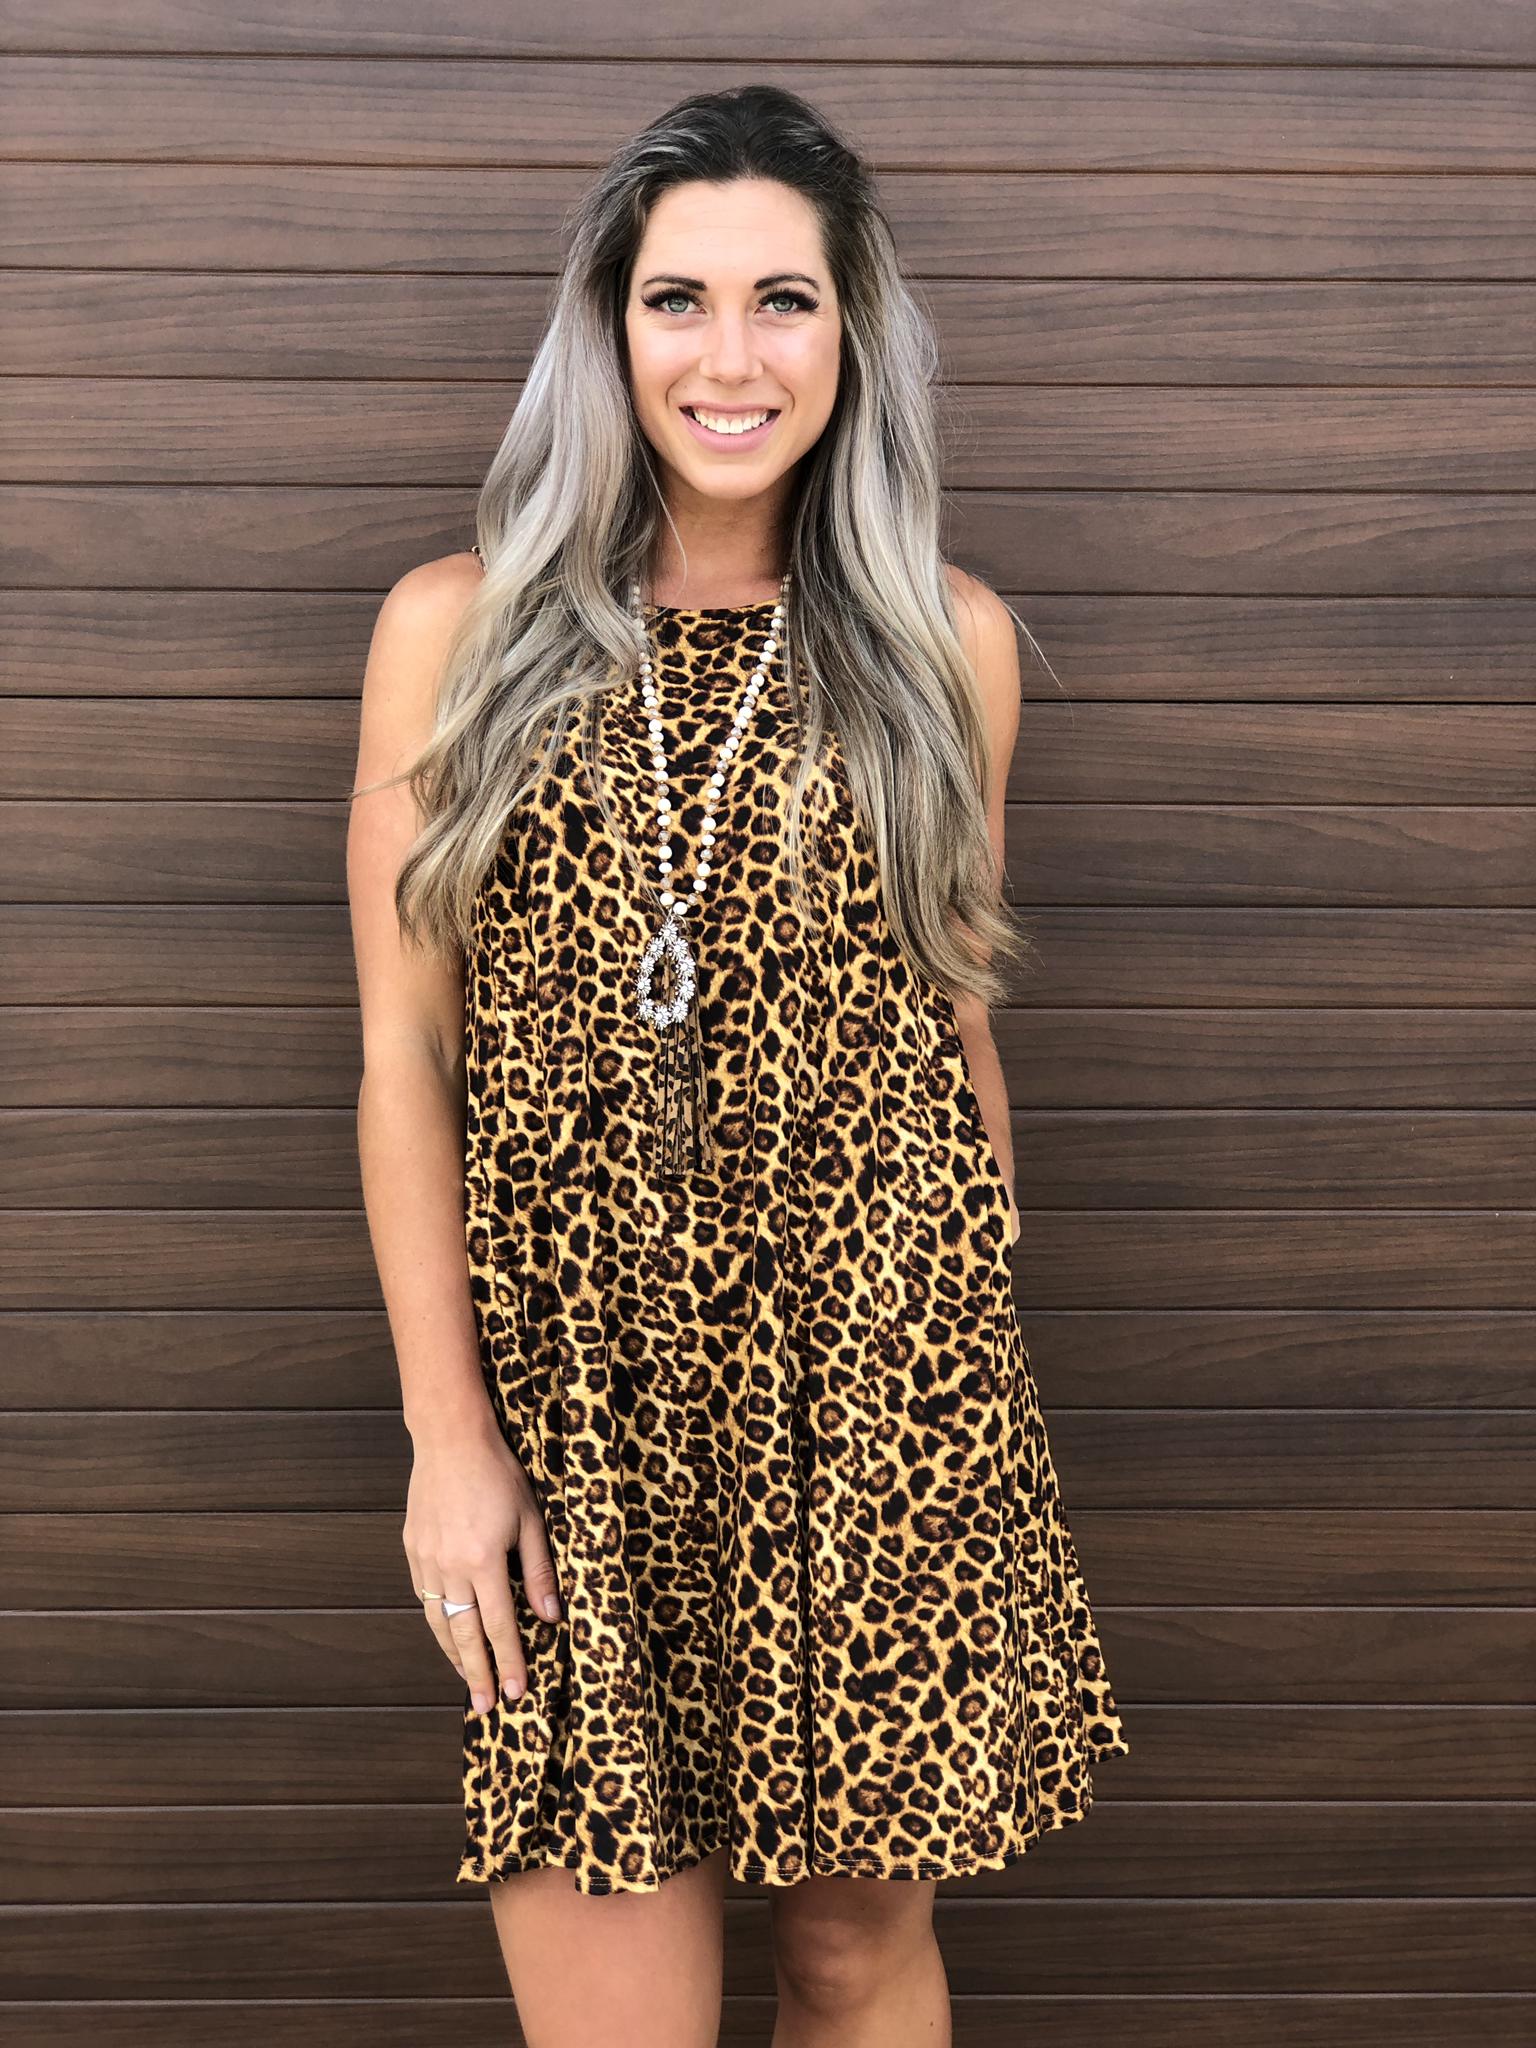 Cheetah Dress 83340